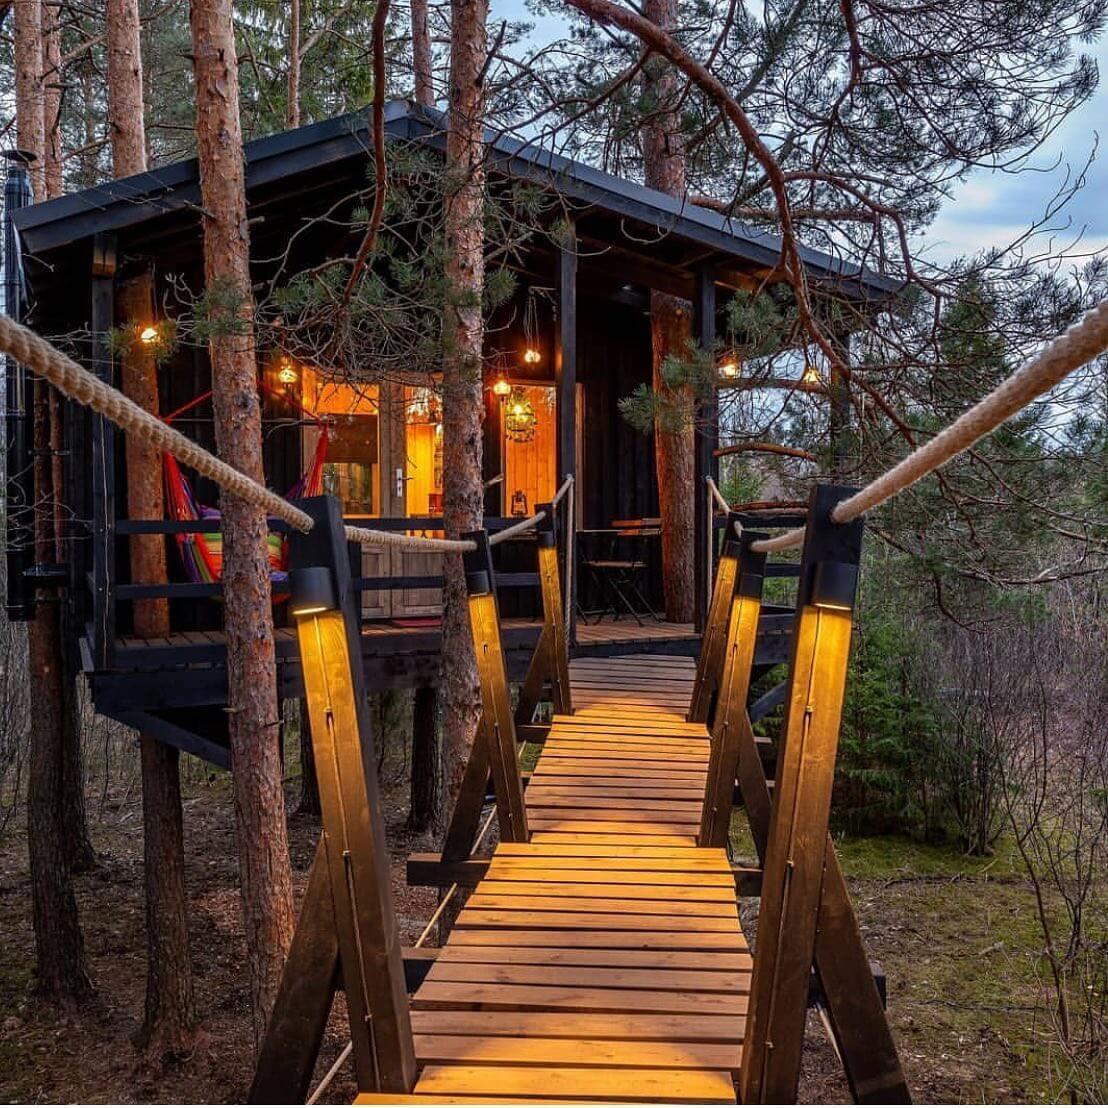 Sambliku Treehouse